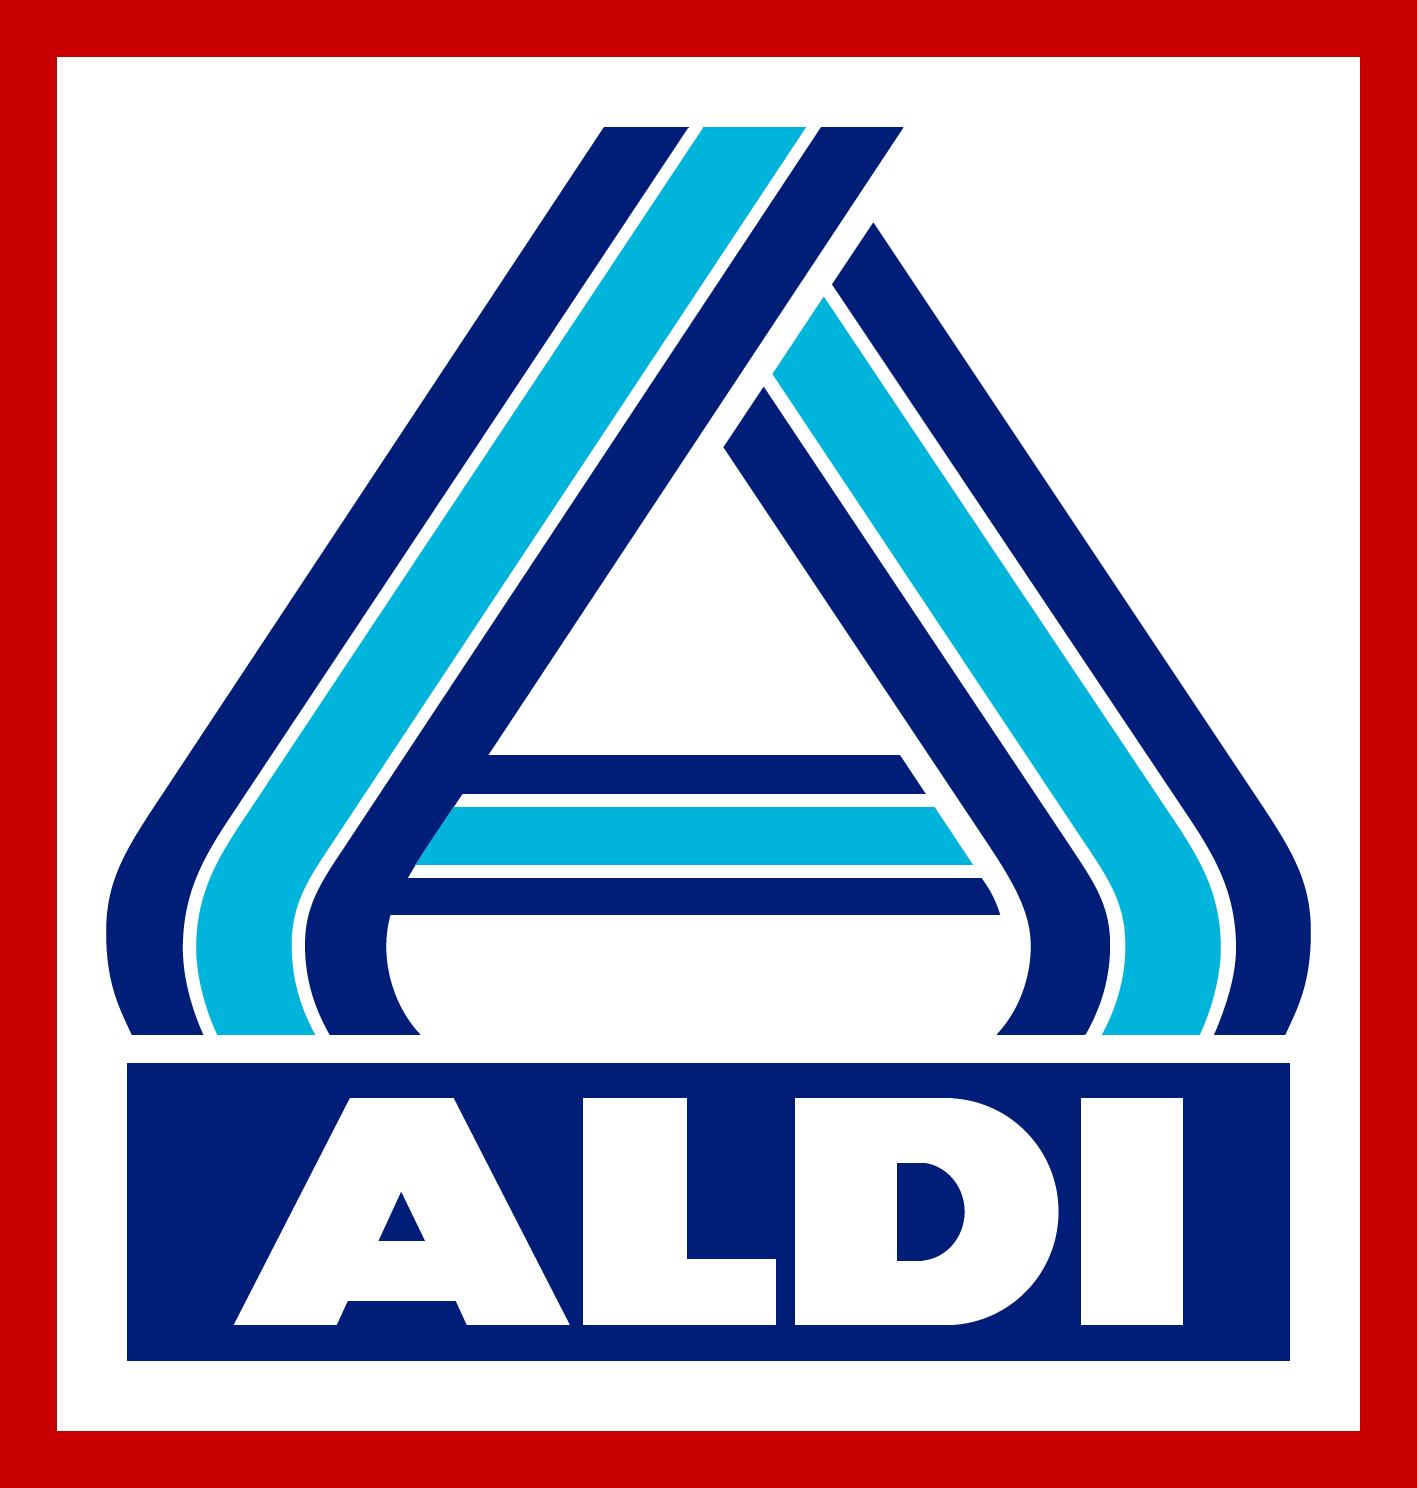 ALDI NordLogo Image